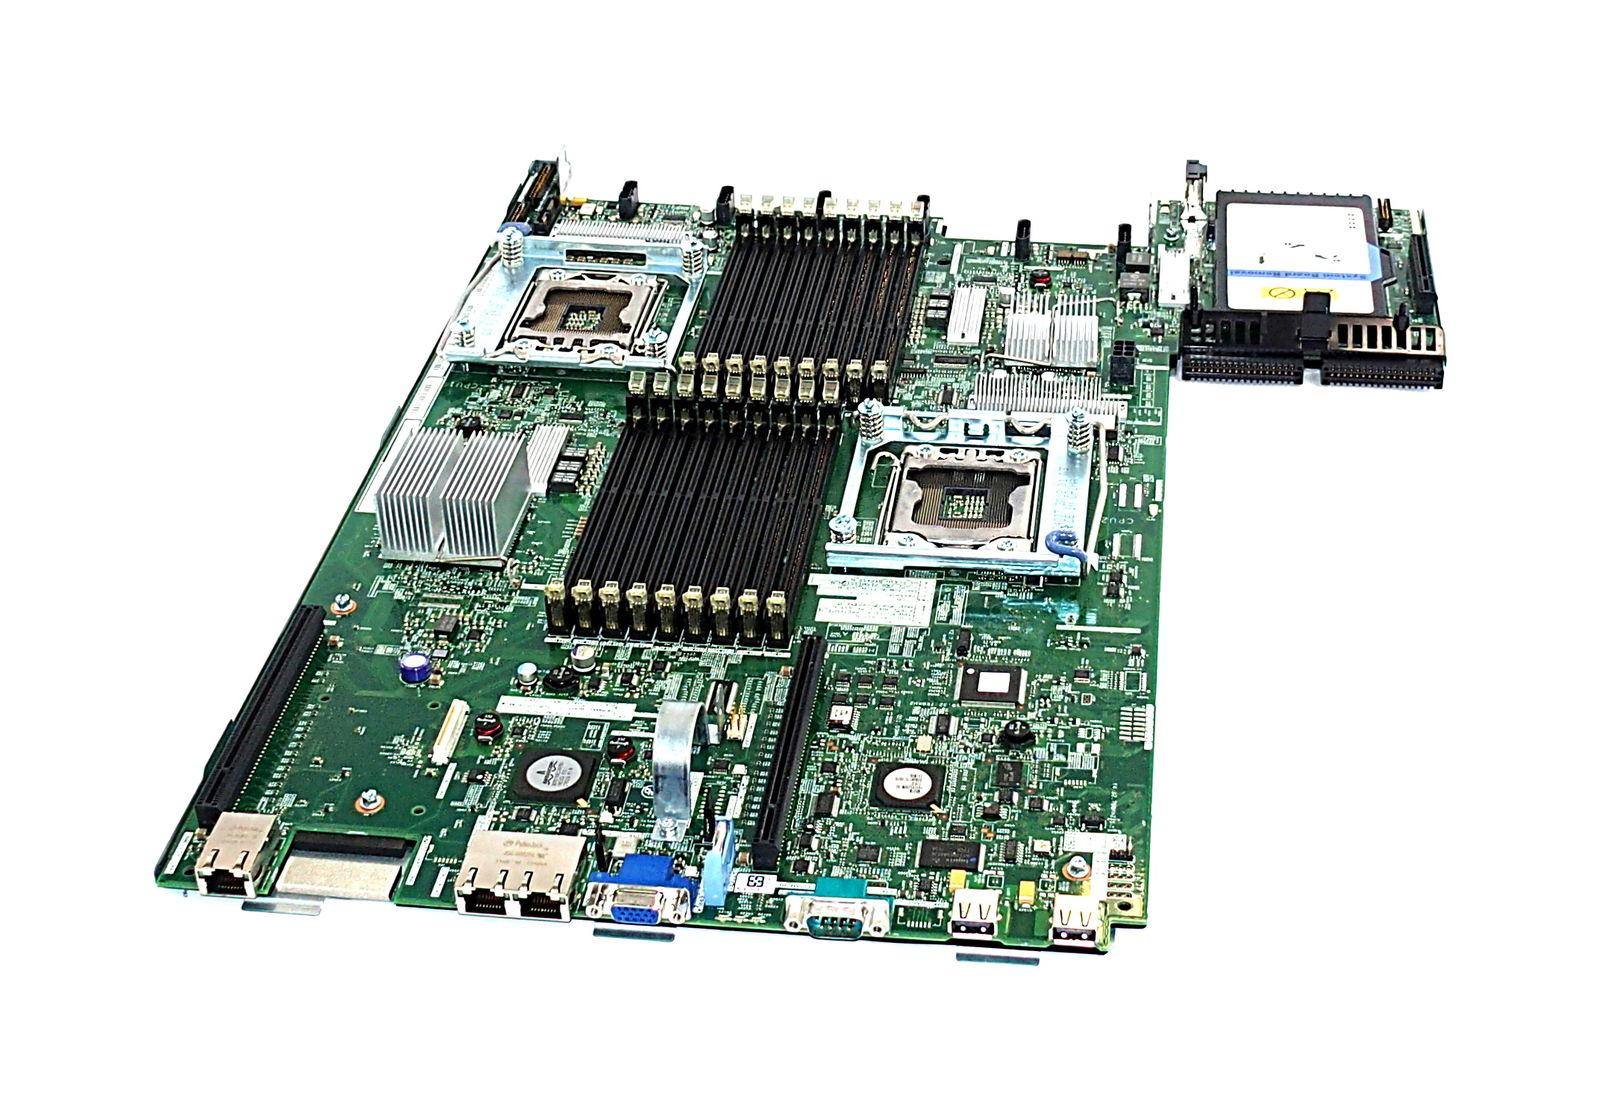 [Used] FRU 00D3284 – IBM X3650 M3/X3550 M3 SYSTEM BOARD